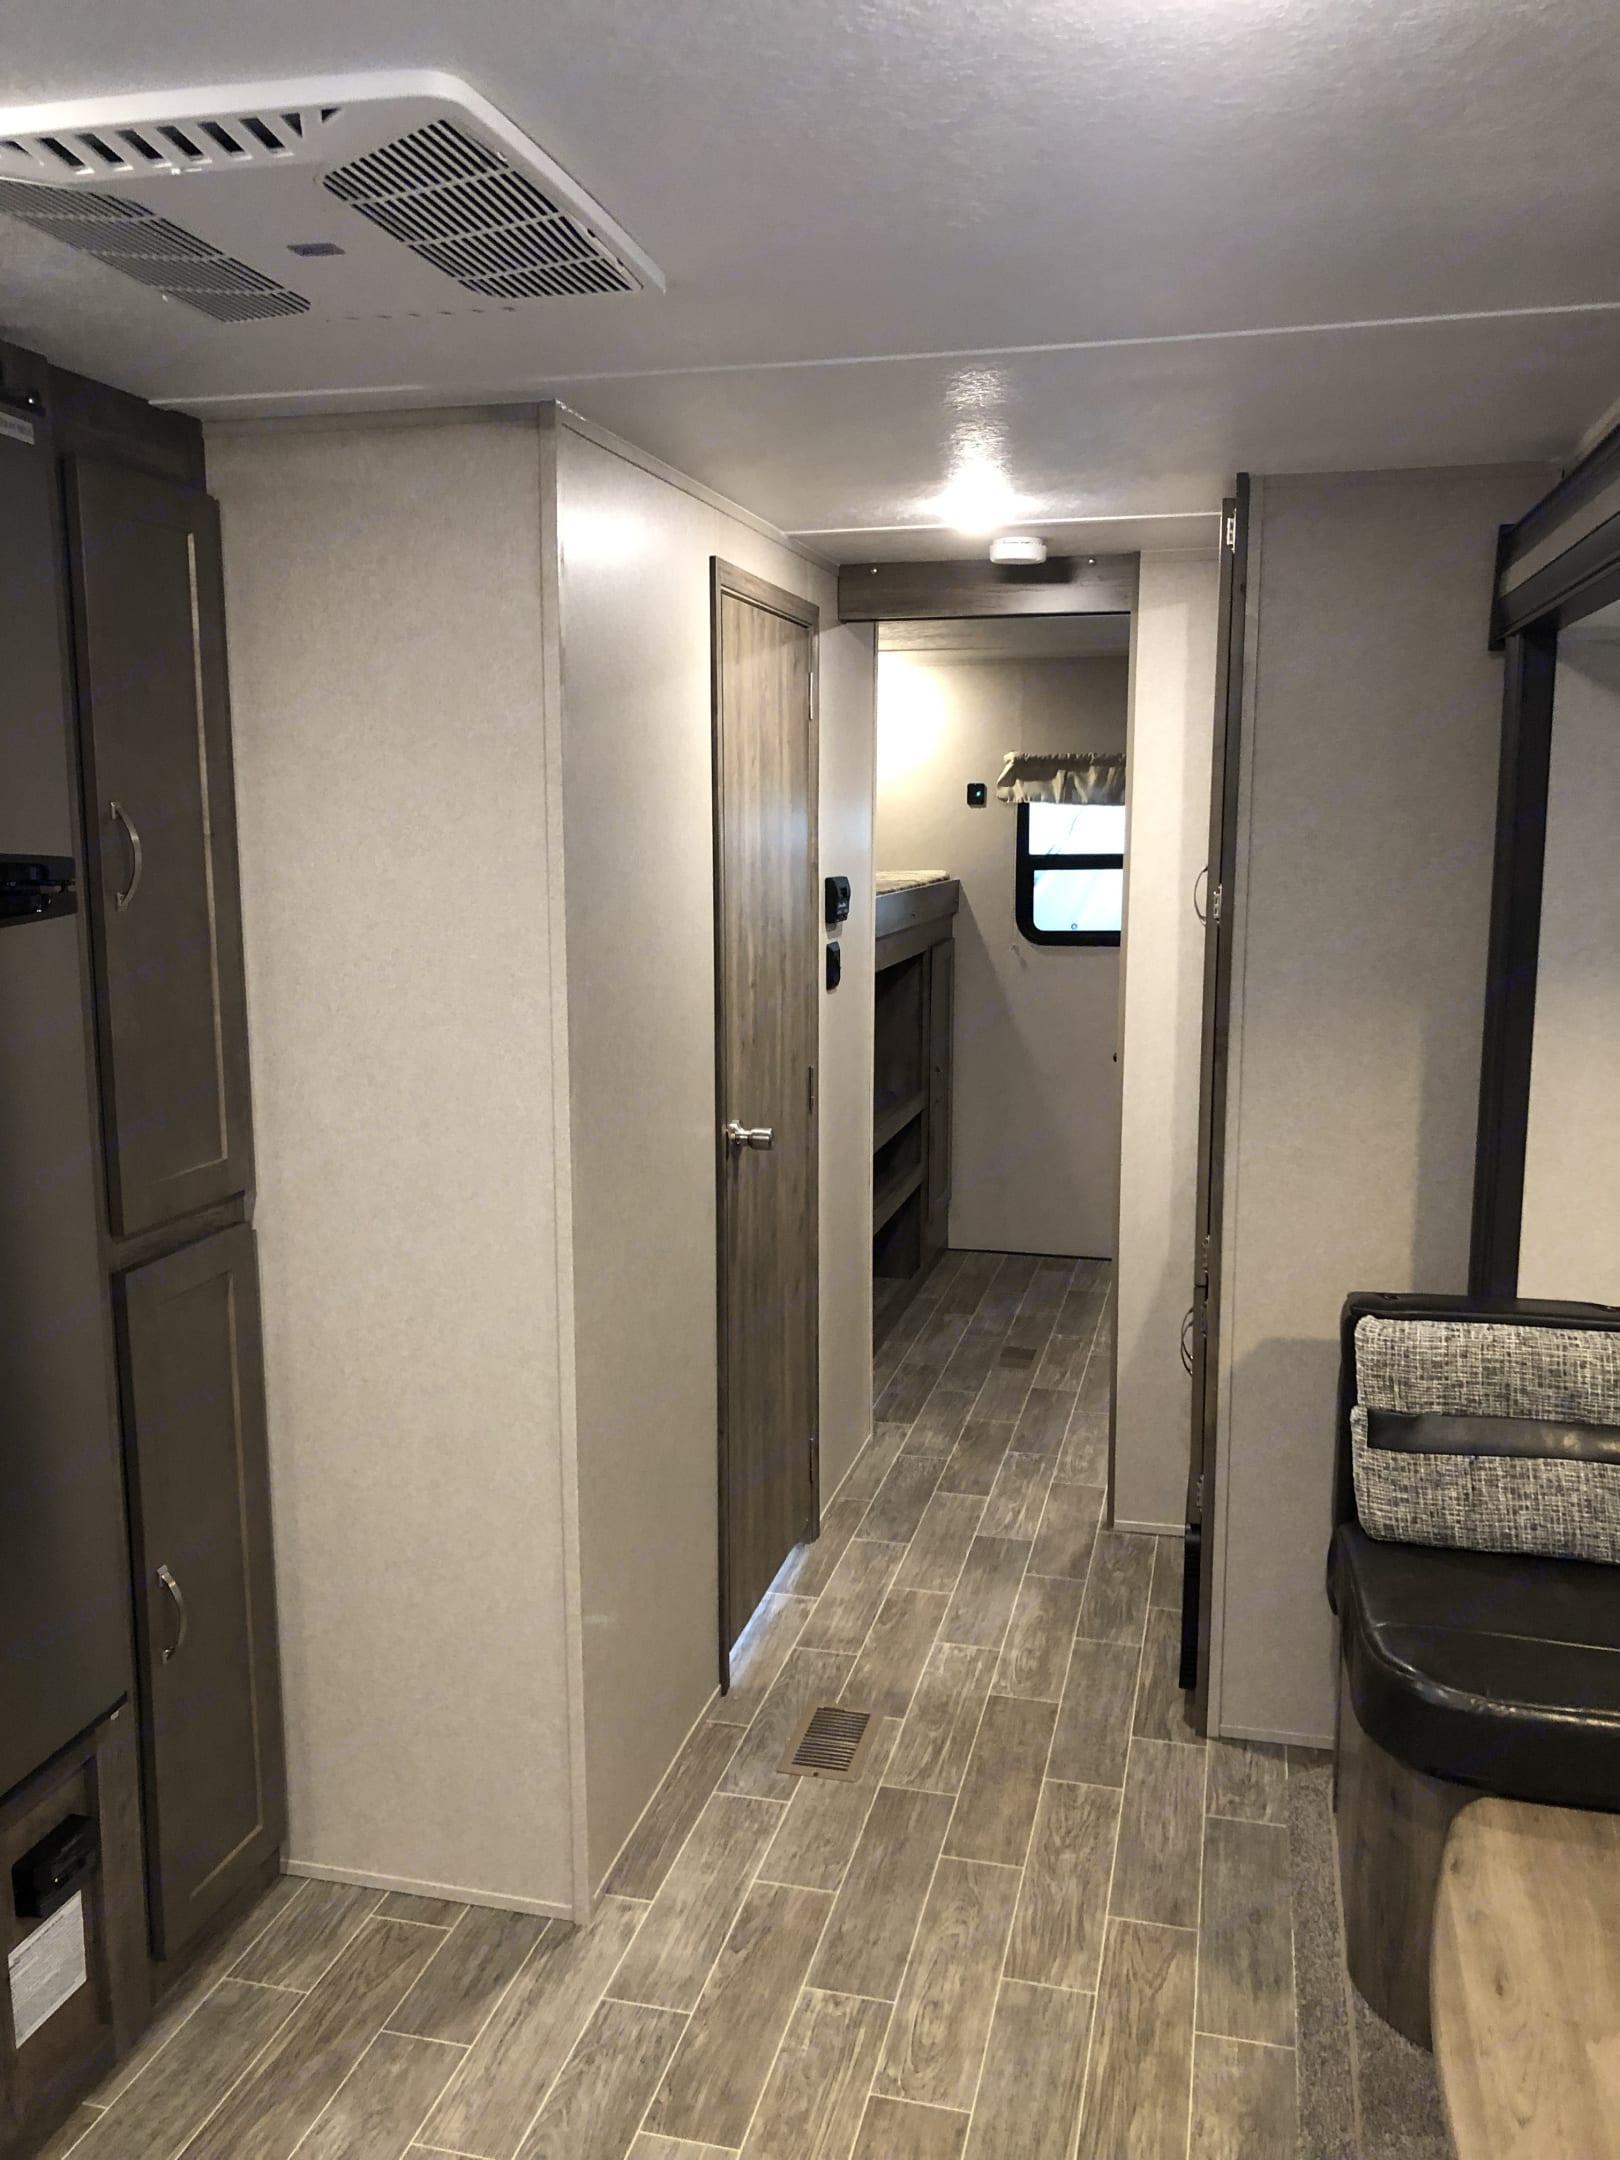 back room - bunkhouse . Palomino Puma 2019